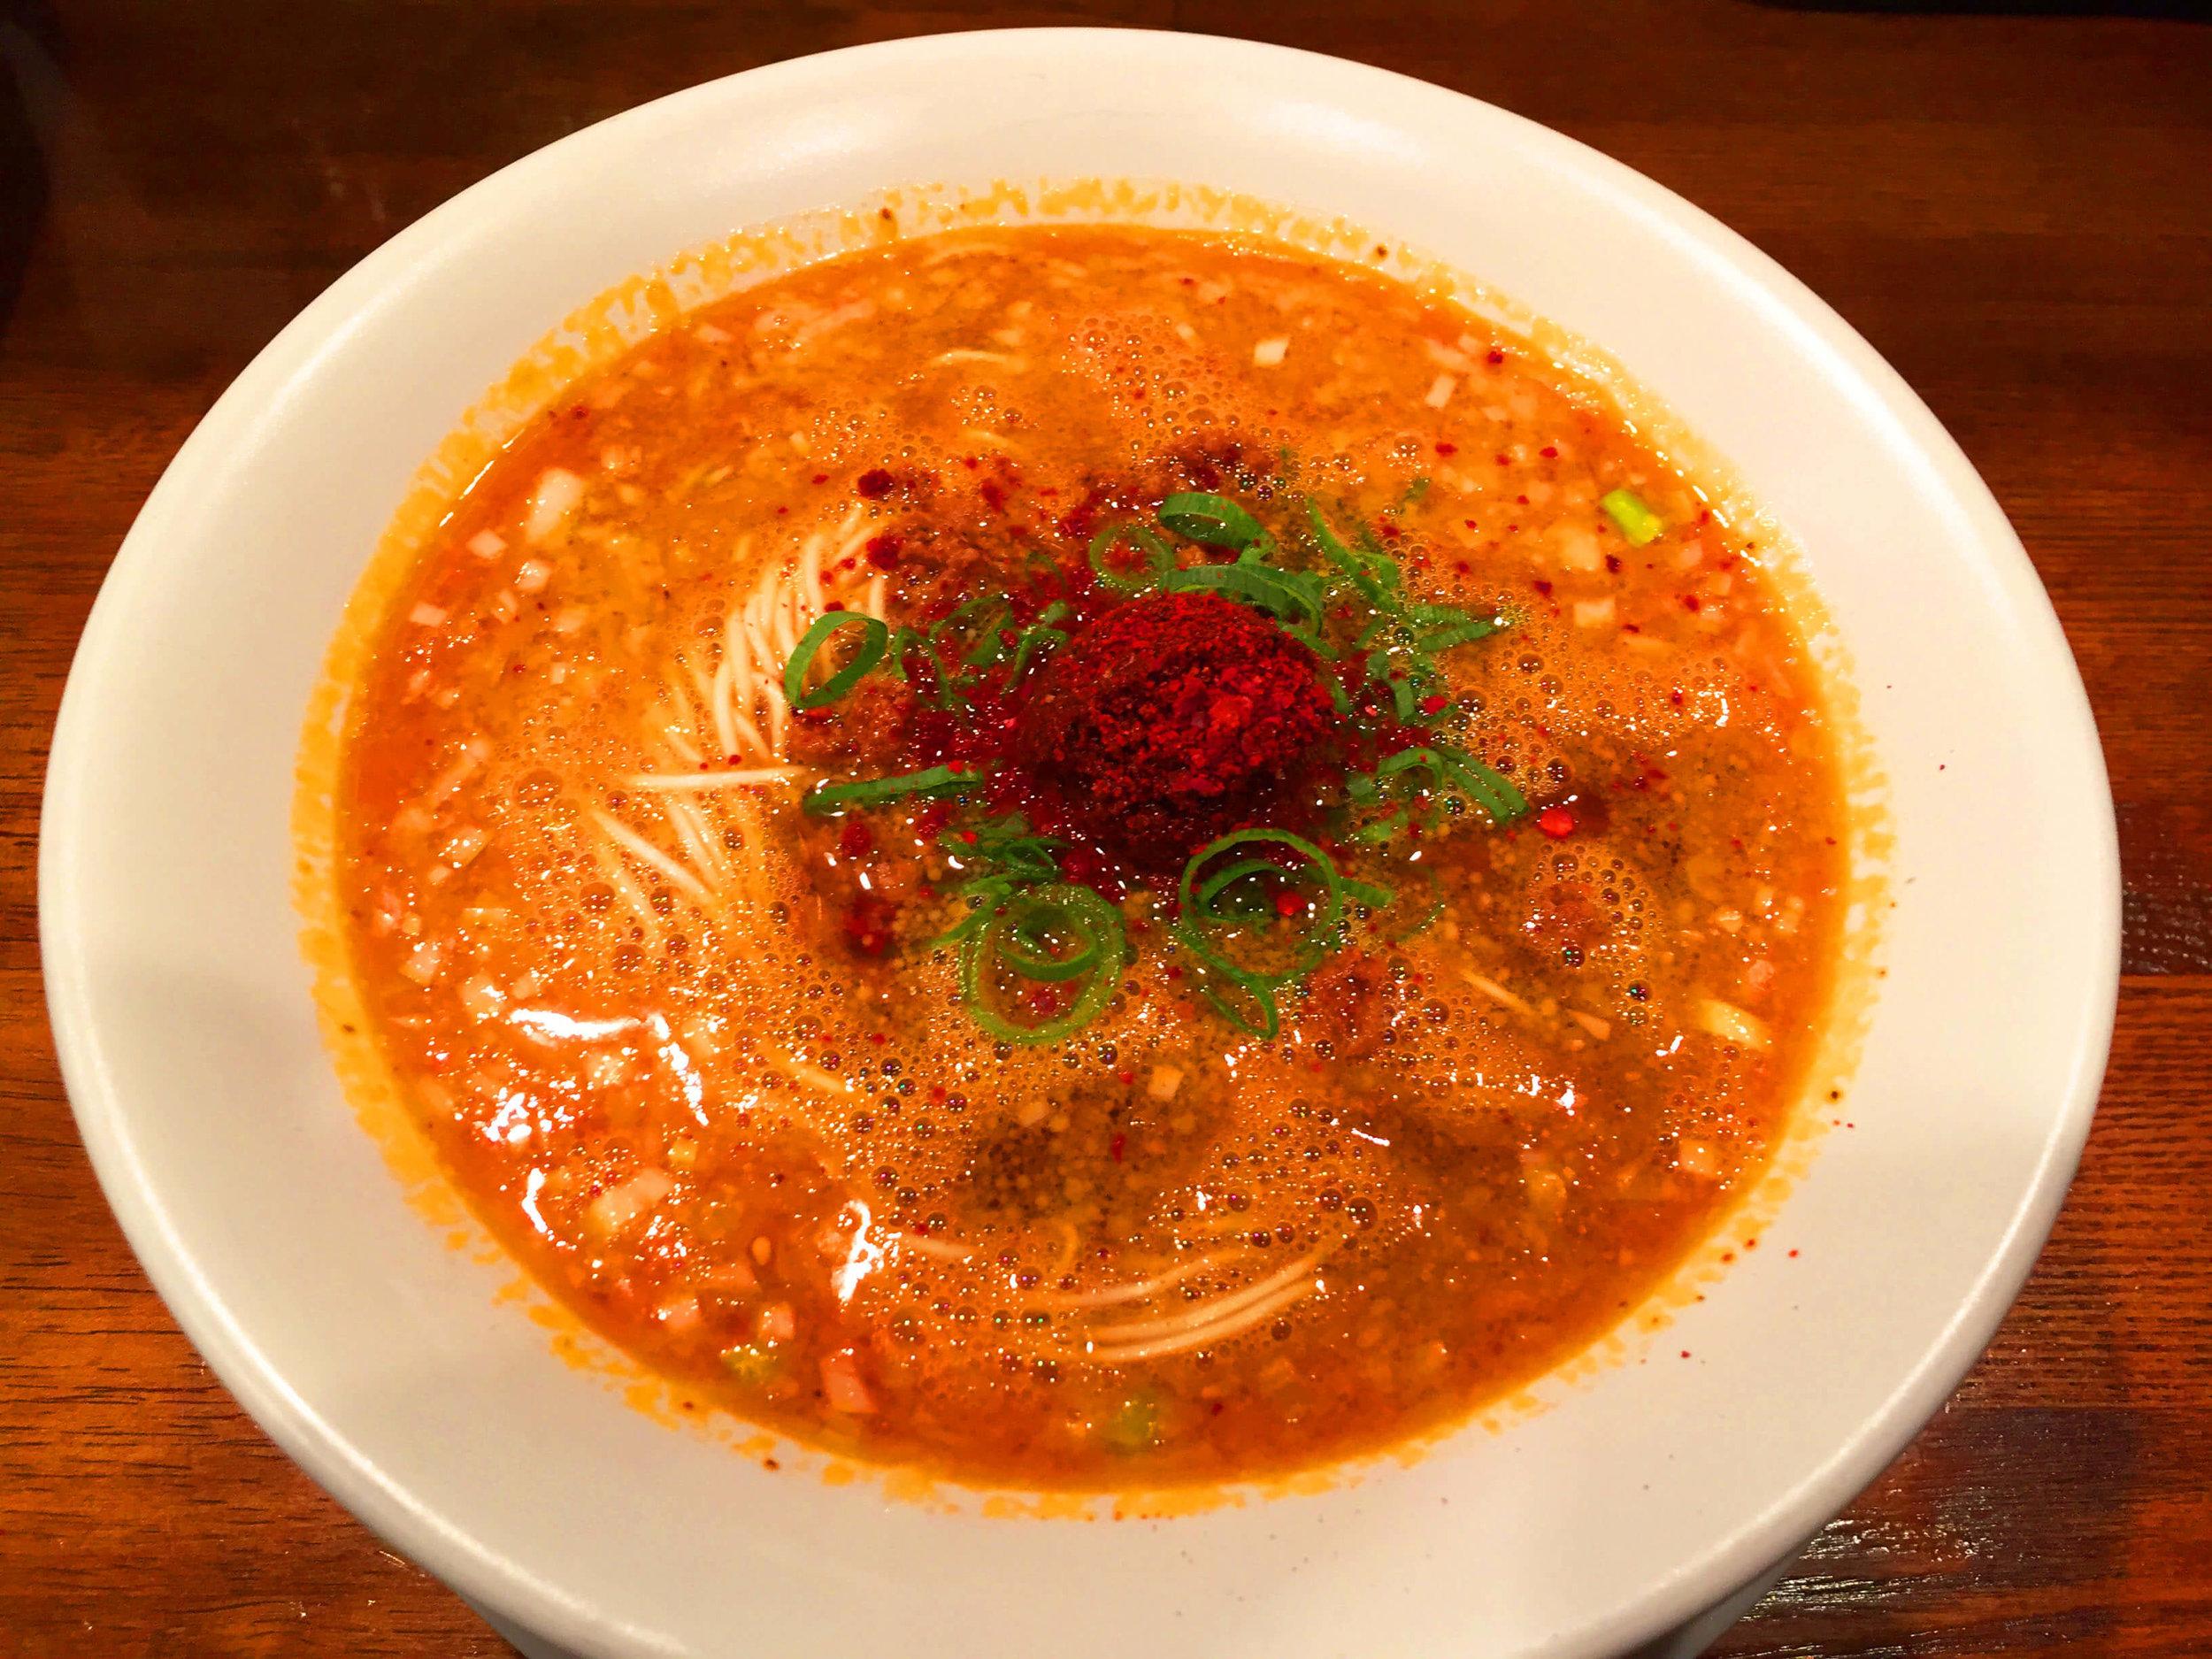 Michelin Star Spicy Ramen- Just delicious!